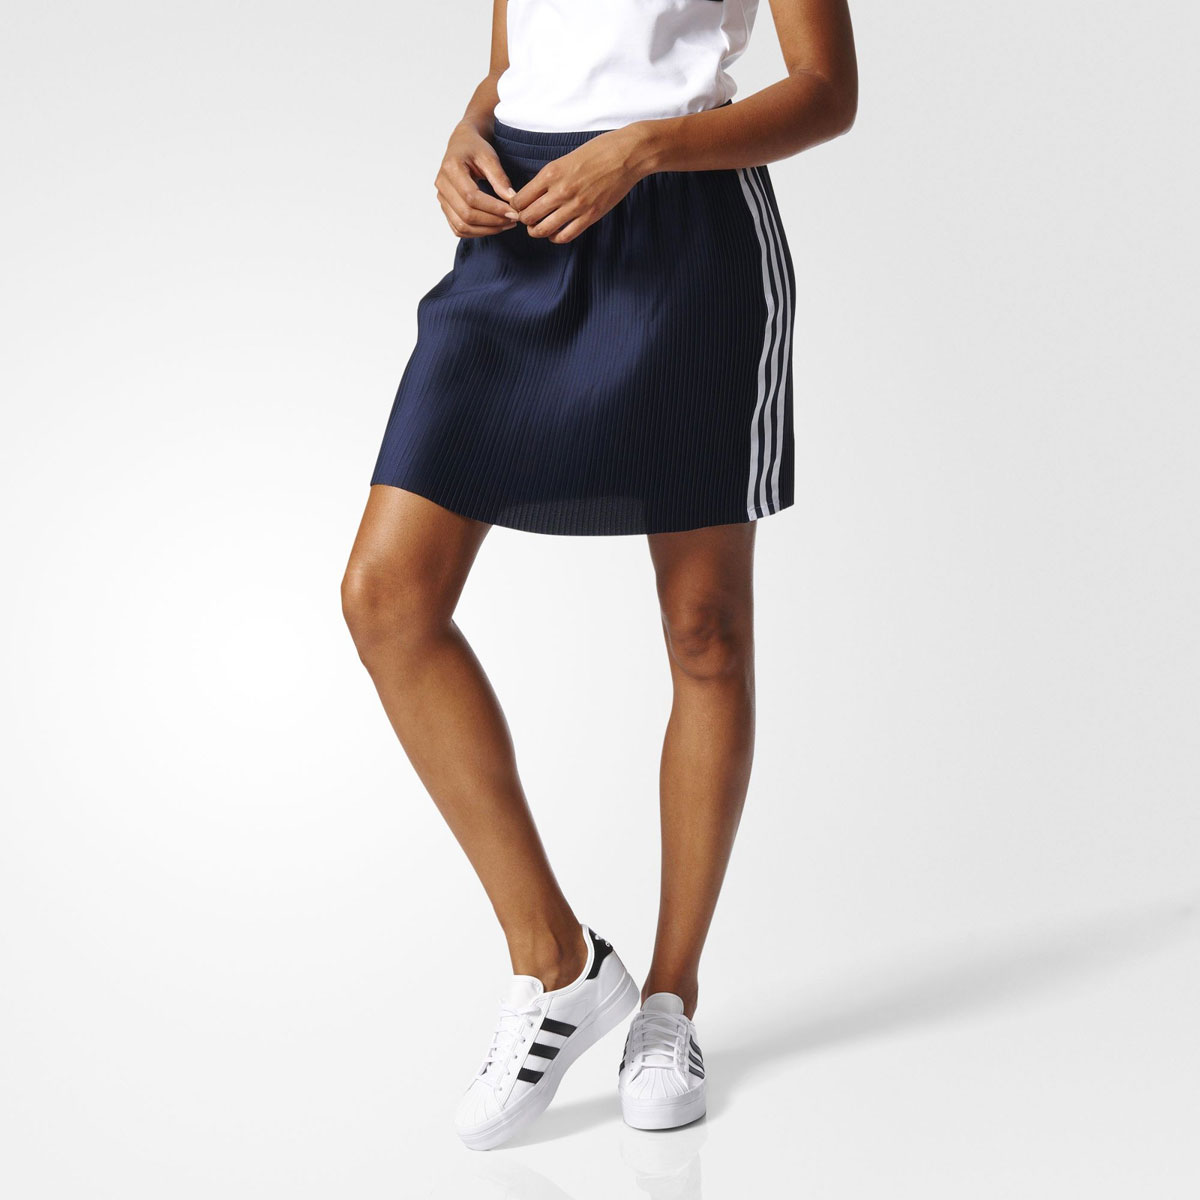 adidas Originals 3 STRIPES SKIRT (아디다스 3 스트라이프 스커트) (Legend Ink) 17 SS-I